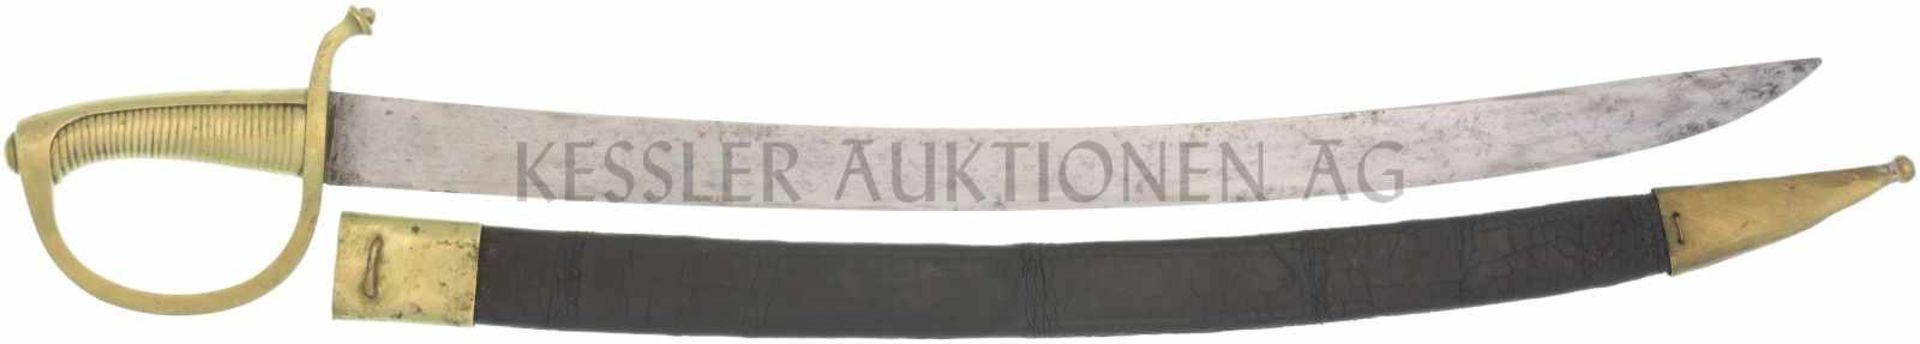 Säbel 1842/52, Briquet, für unberittene Mannschaft KL 596, TL 730mm, volle Wurzel, flacher Rücken